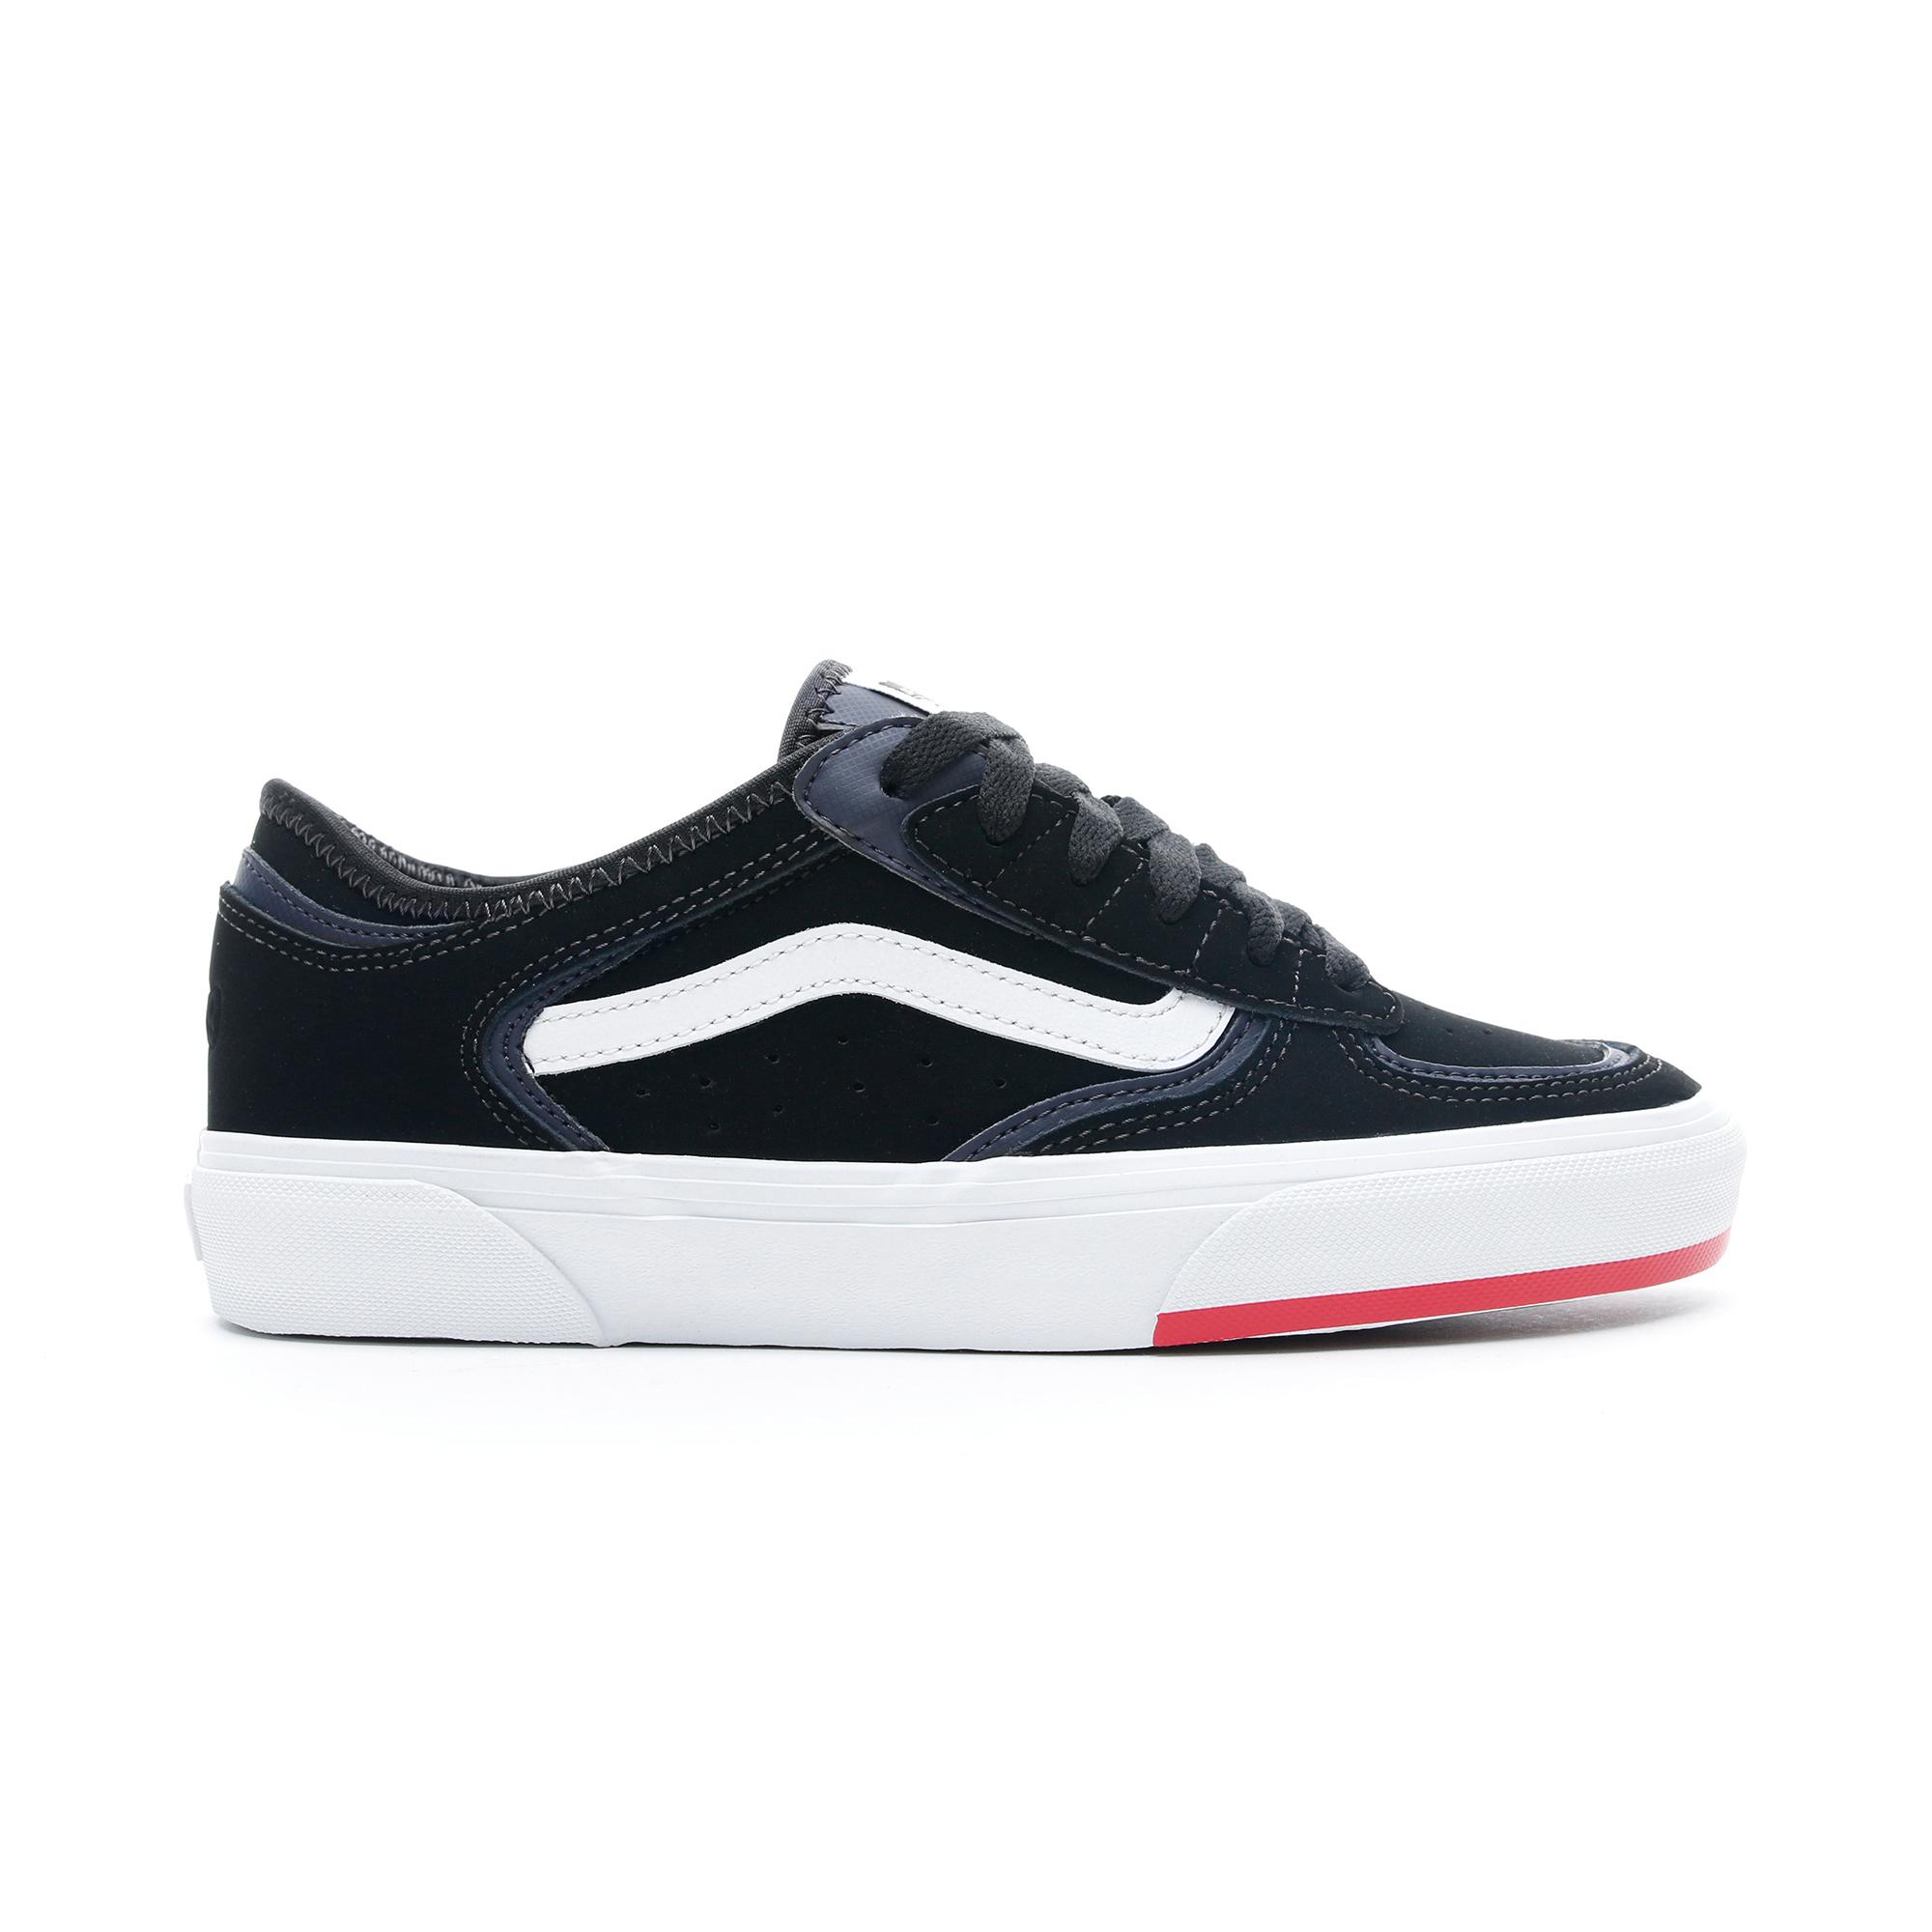 Vans 66/99/19 Rowley Classic Siyah Kadın Sneaker